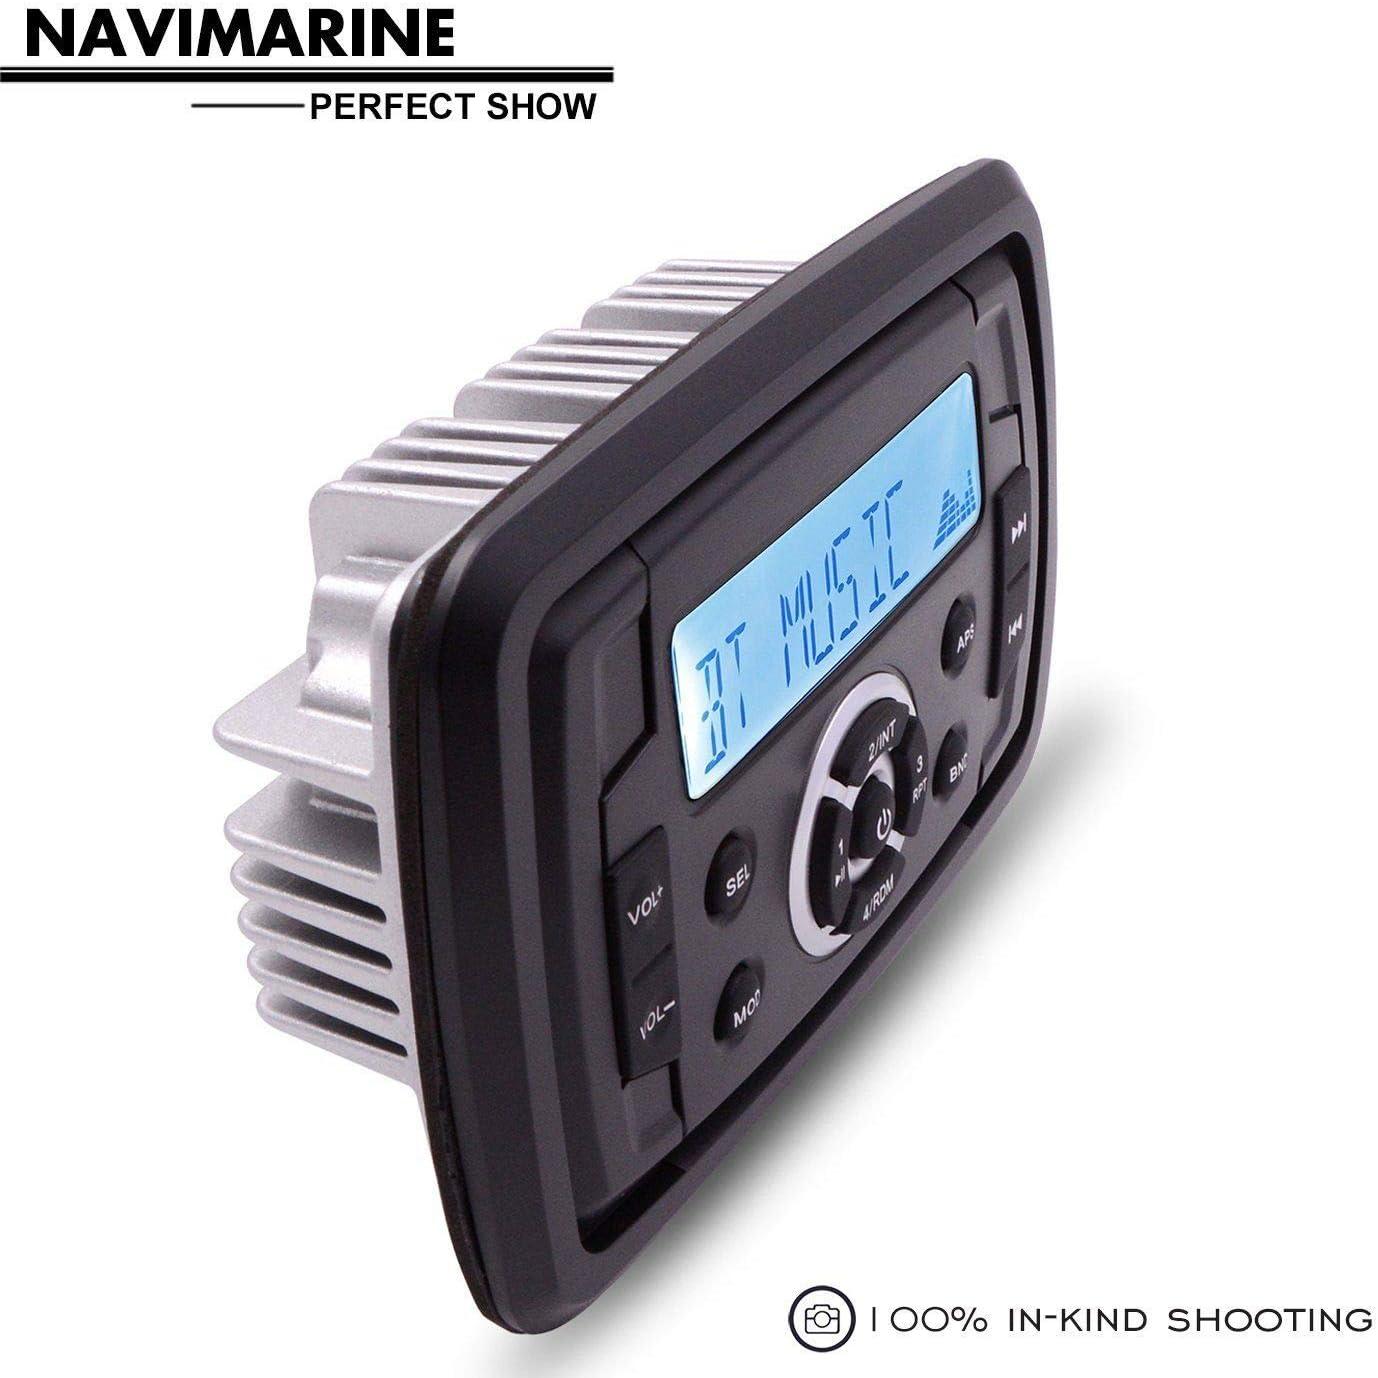 FlashStarhzm Marine Radio Bluetooth Stereo Audio System Square Receiver Waterproof for CAR Boat ATV